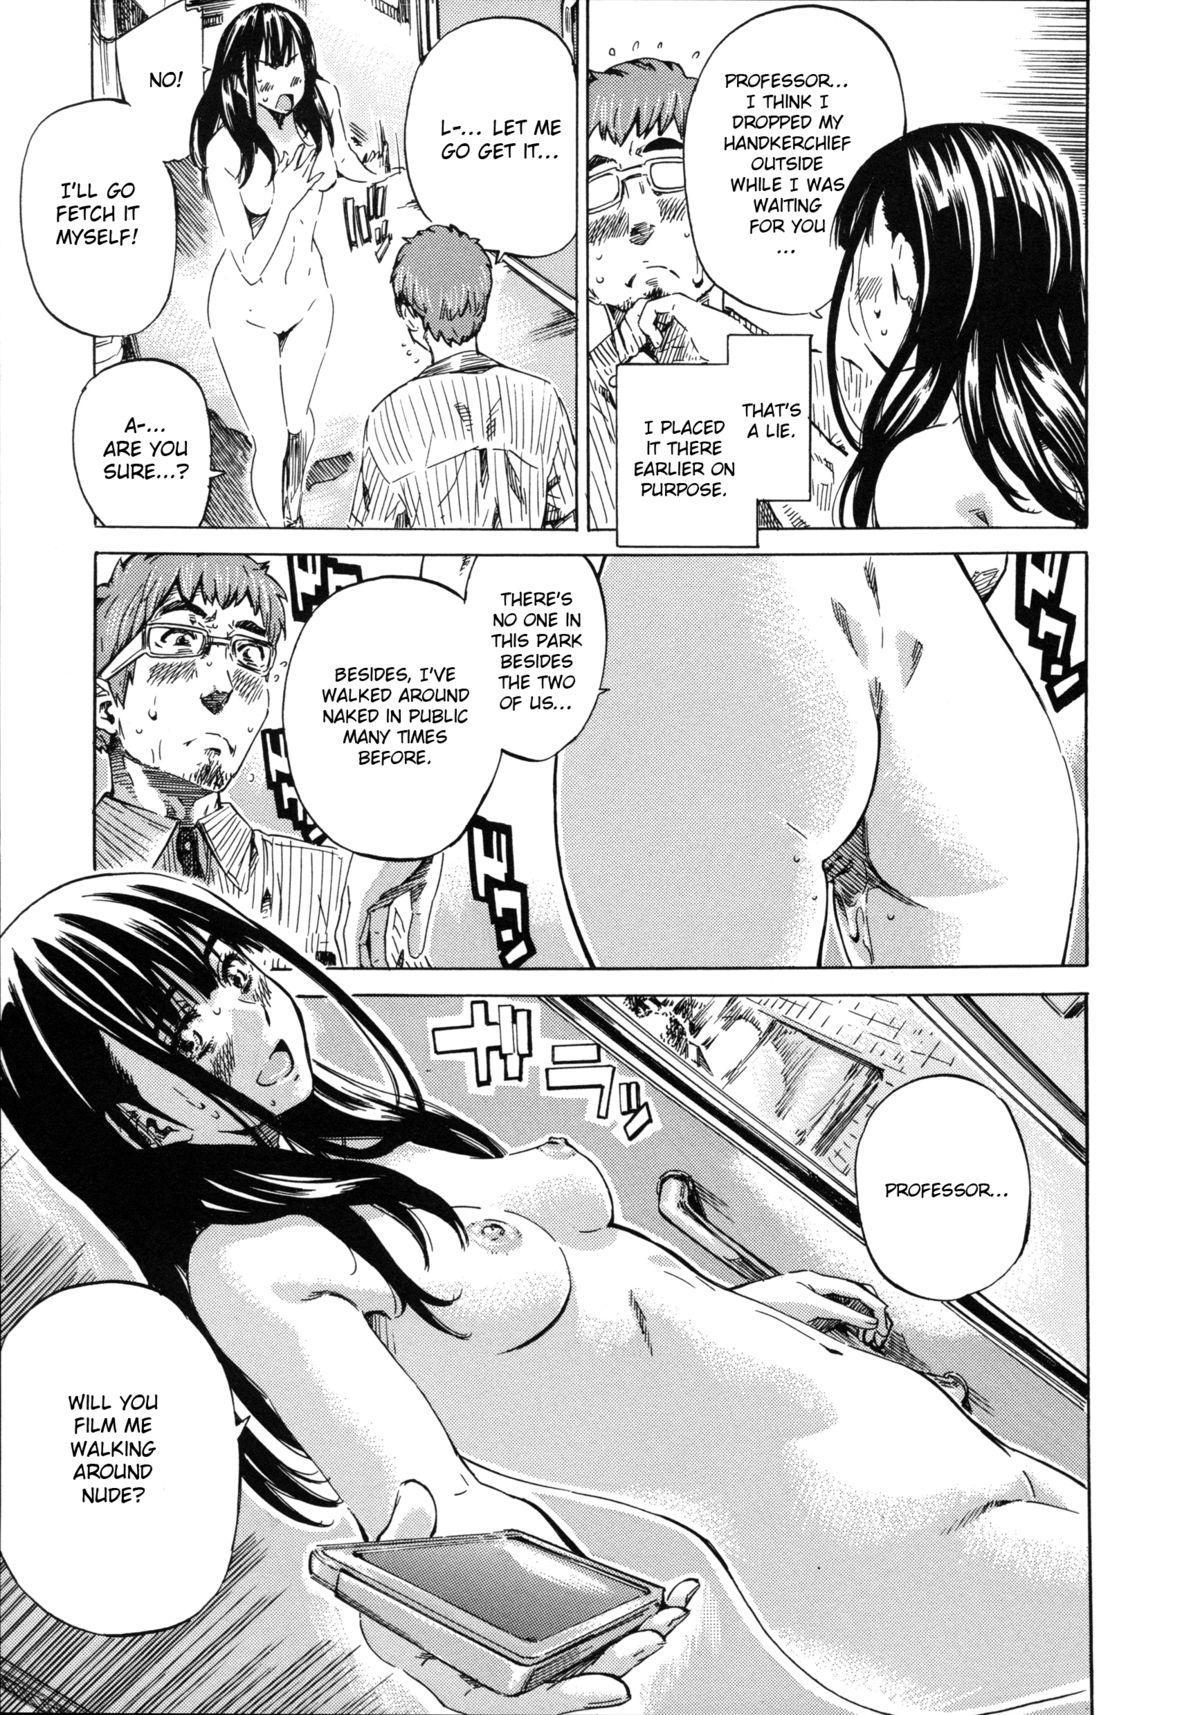 Kashiwazaki Miki wa Ironna Basho de Zenra Sanpo Shitemita | Miki Kashiwazaki Goes Naked in All Sorts of Places 95